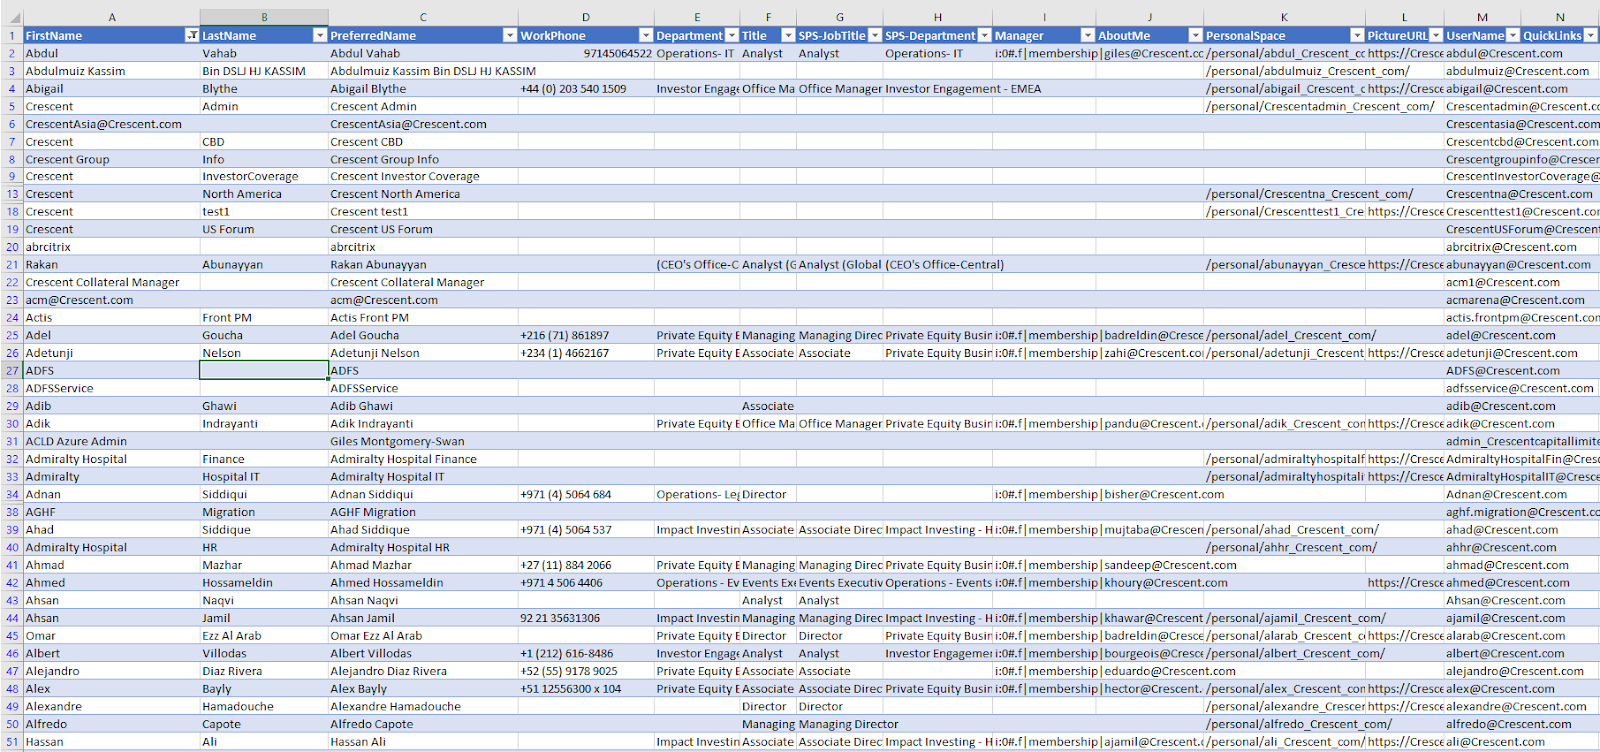 sharepoint online get all user profiles powershell